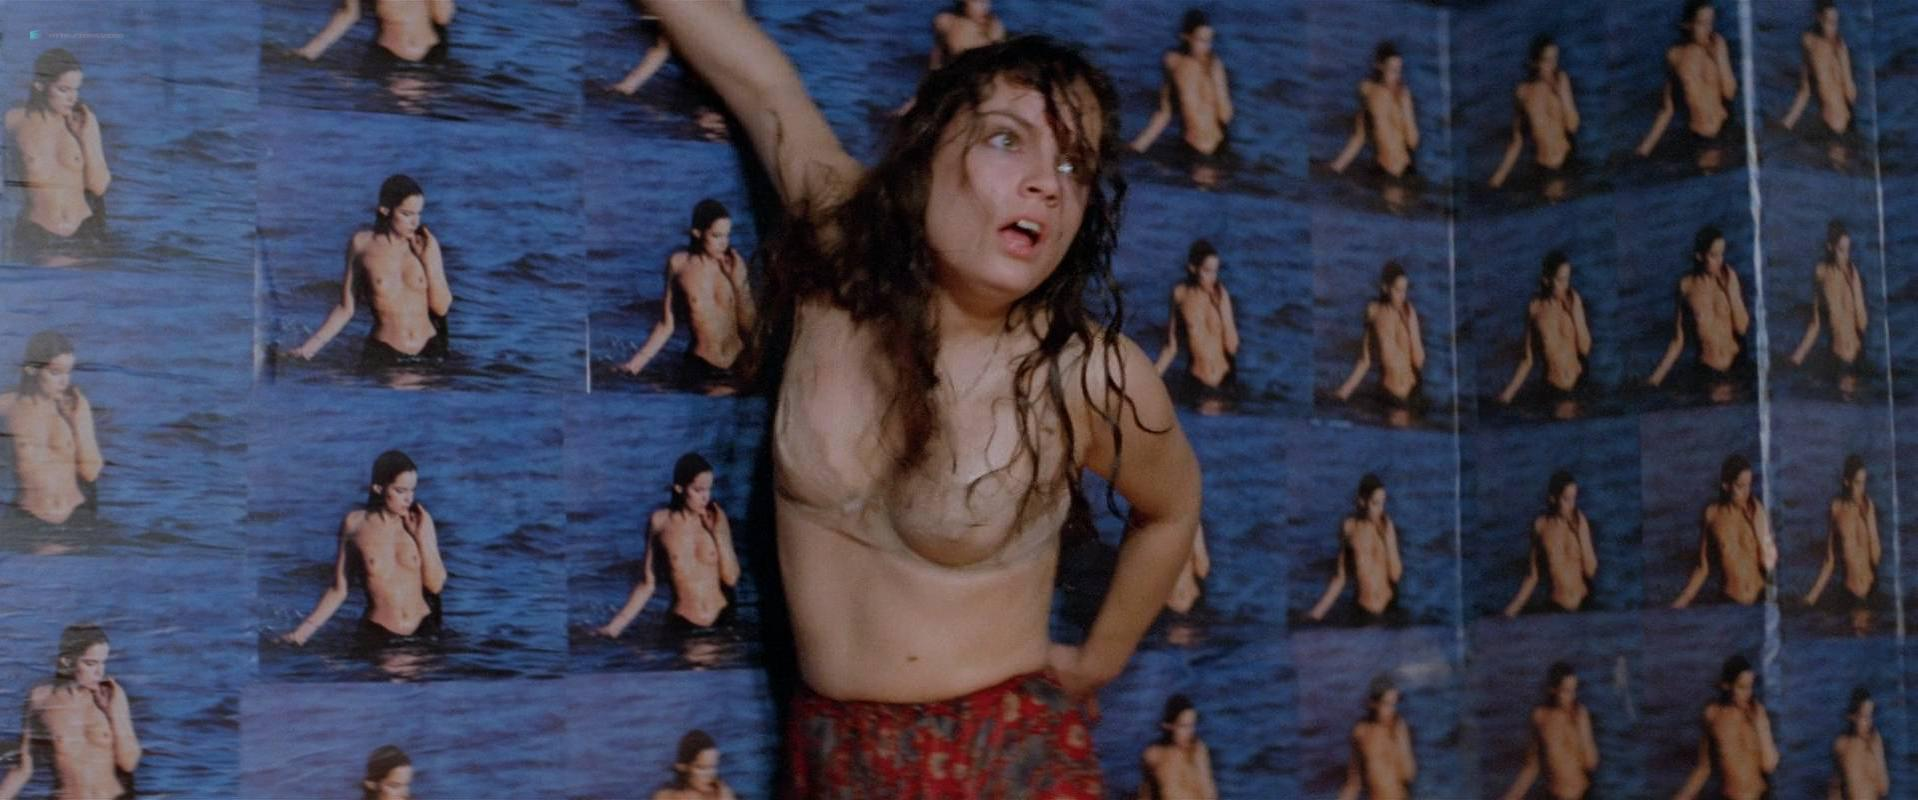 Sigrid Thornton nude - Snapshot (1979)